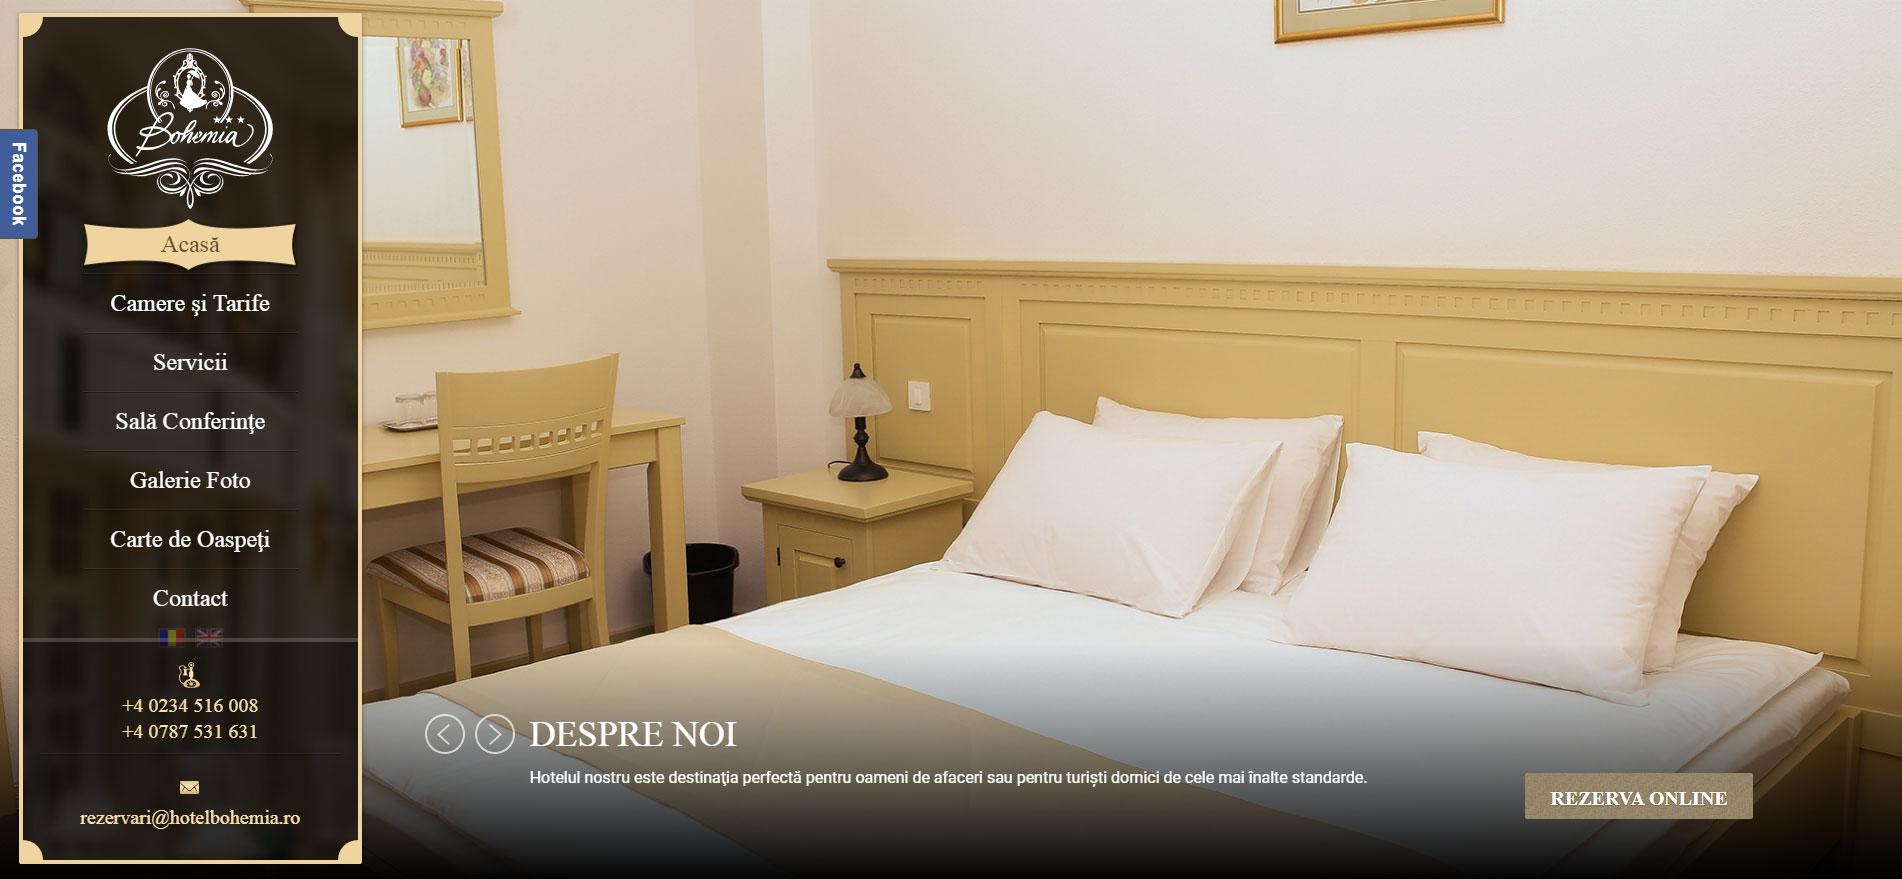 HotelBohemia.ro